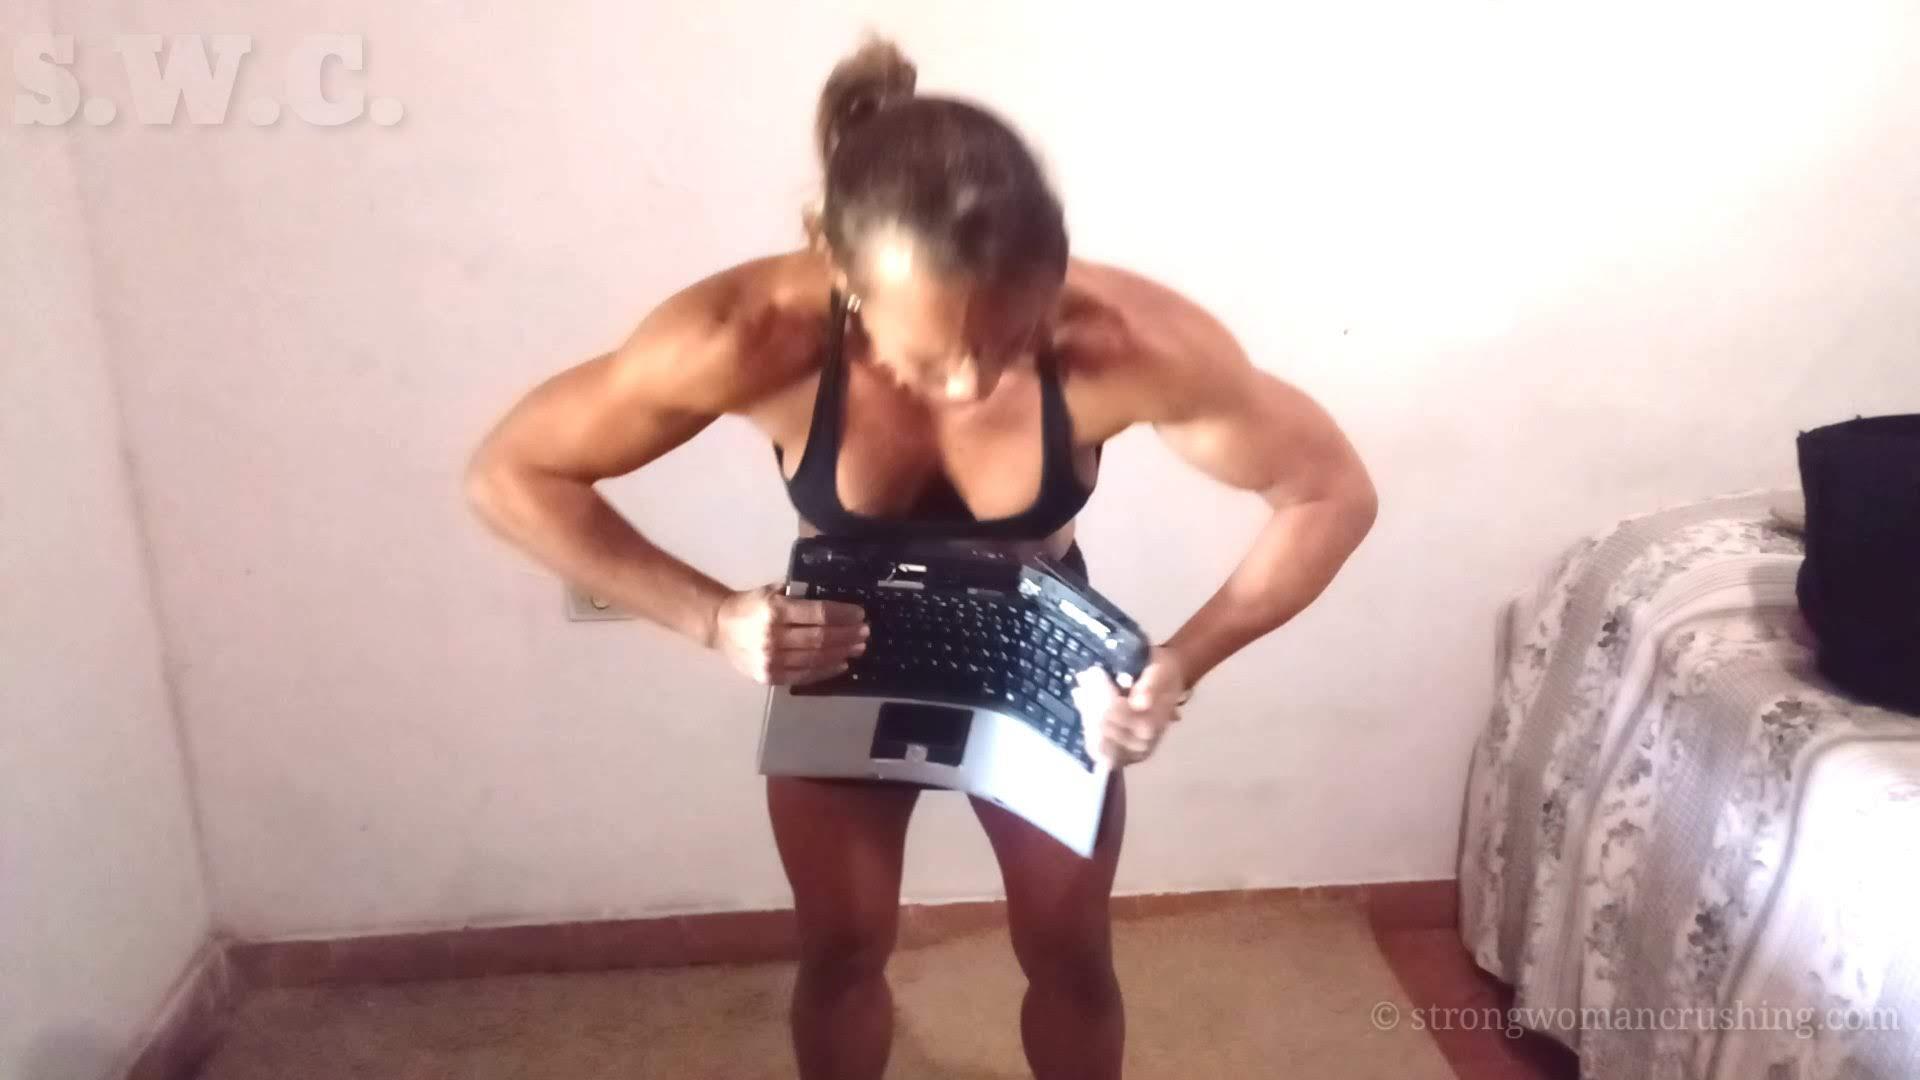 Maria Luiza tears a Notebook in a half